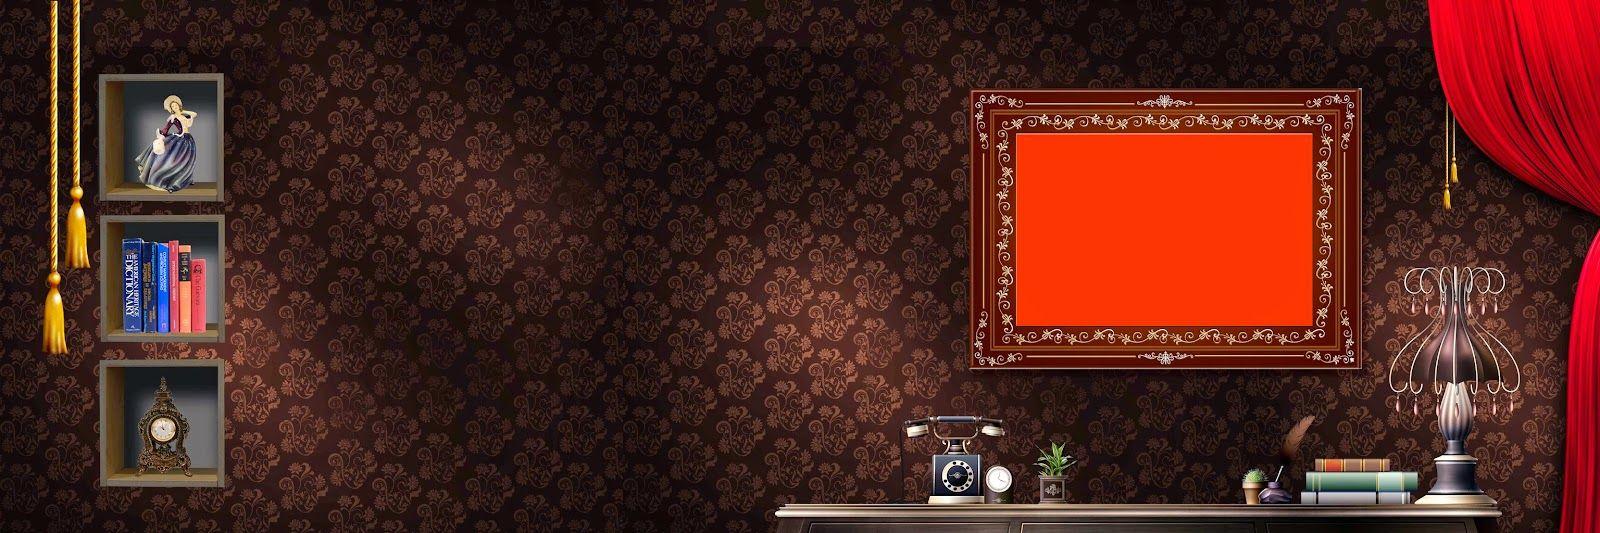 12x36 Album Psd Files Free Downloads Photo Album Design Indian Wedding Album Design Psd Free Photoshop